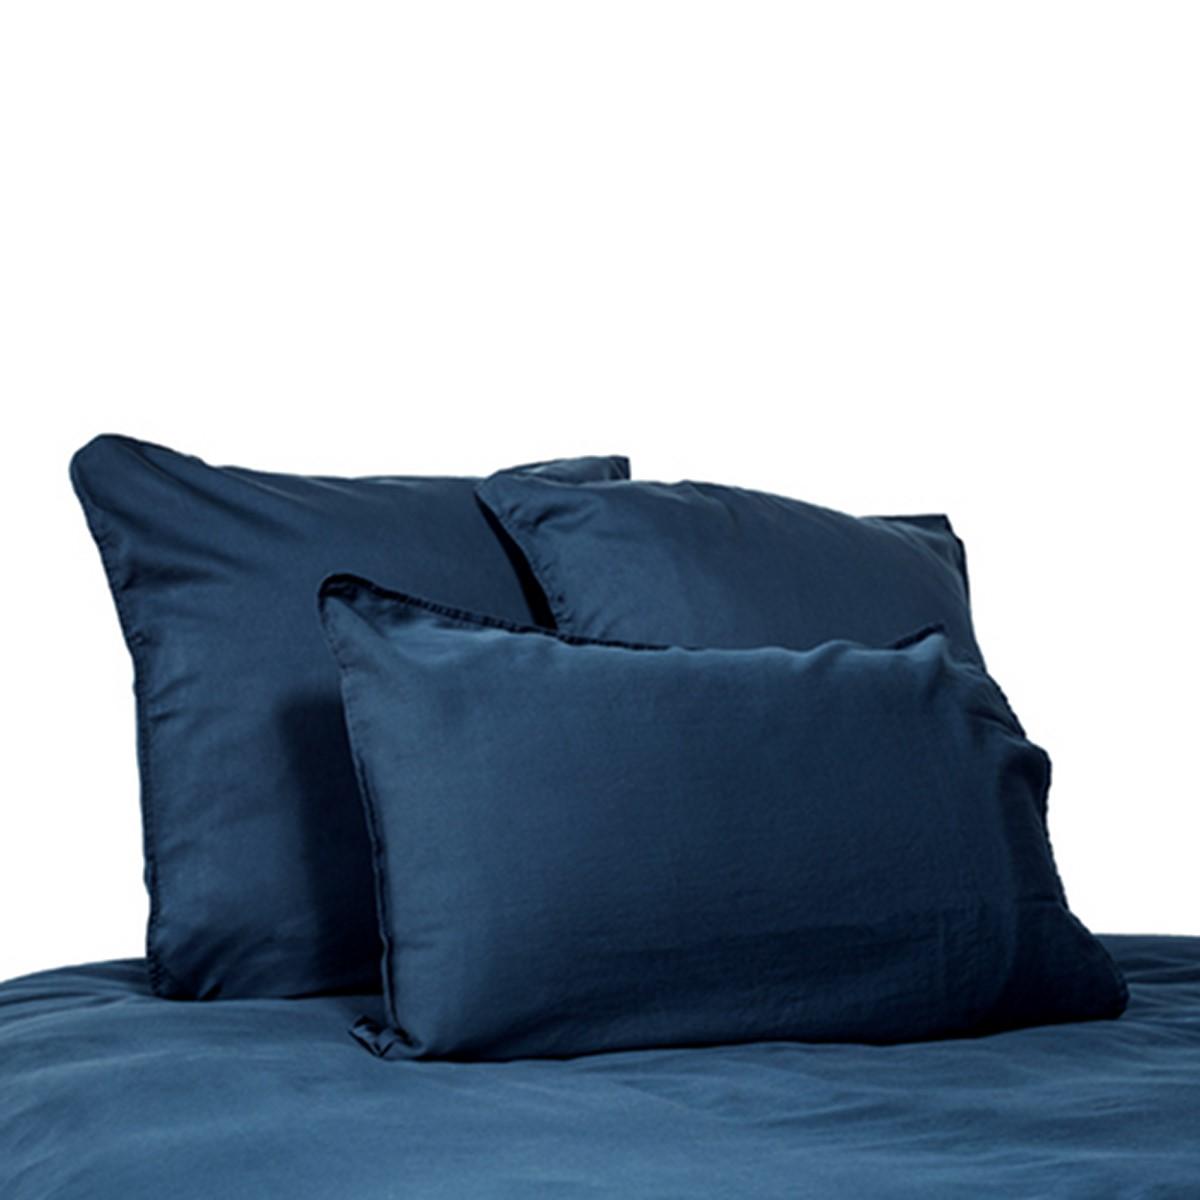 drap housse 180x200 eternity satin de coton lav clara linge. Black Bedroom Furniture Sets. Home Design Ideas